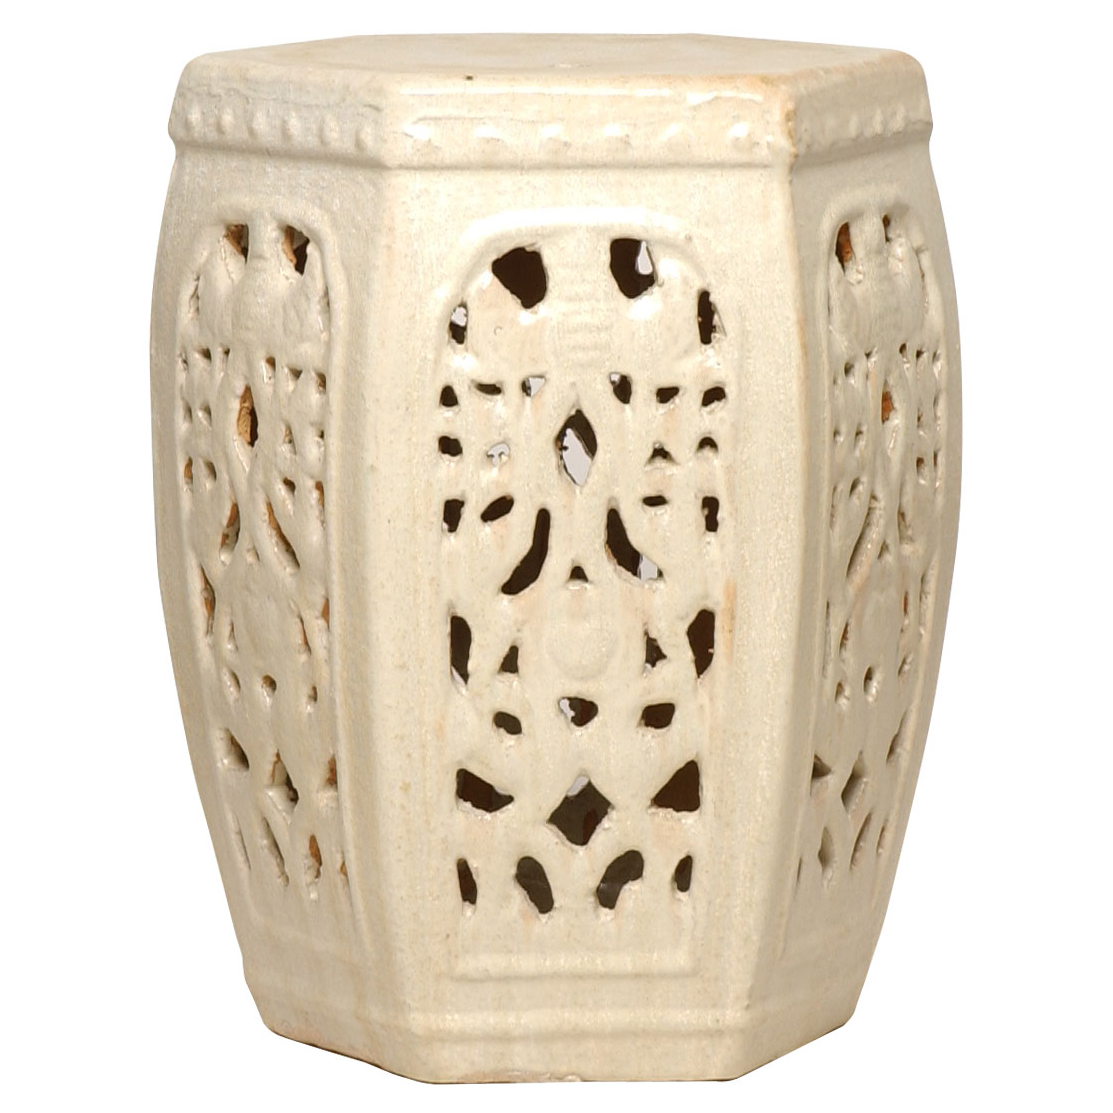 Hexagon Pierced Ceramic Garden Stool- Champagne Antique White Glaze